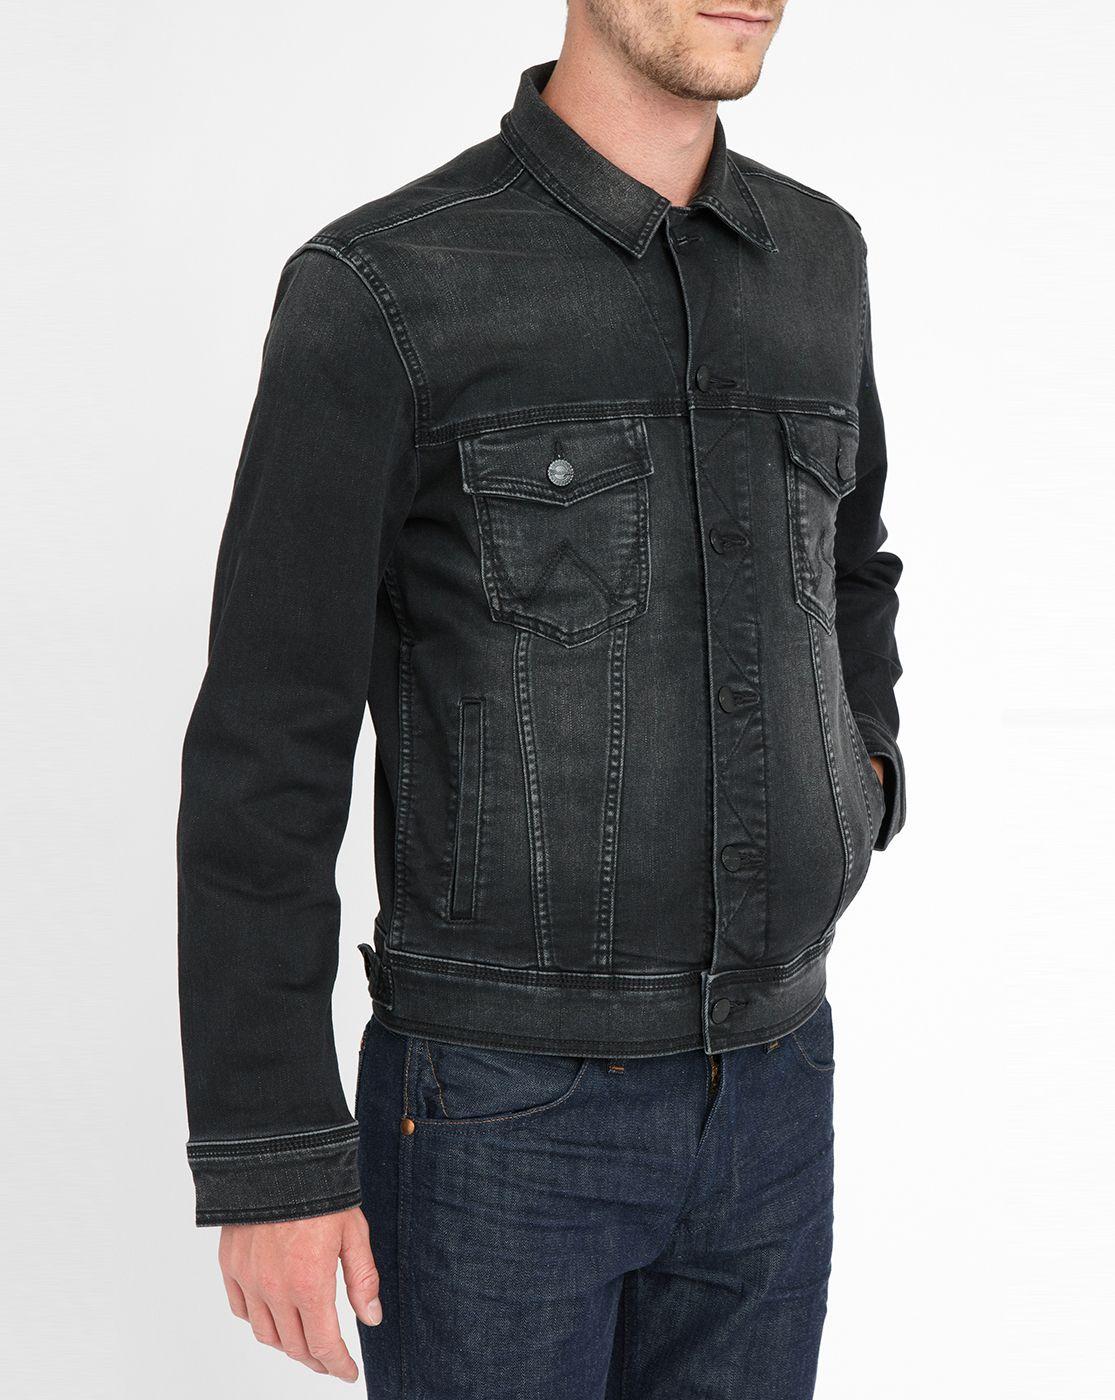 Black Faded Jean Jacket Denim jacket men, Jackets, Black